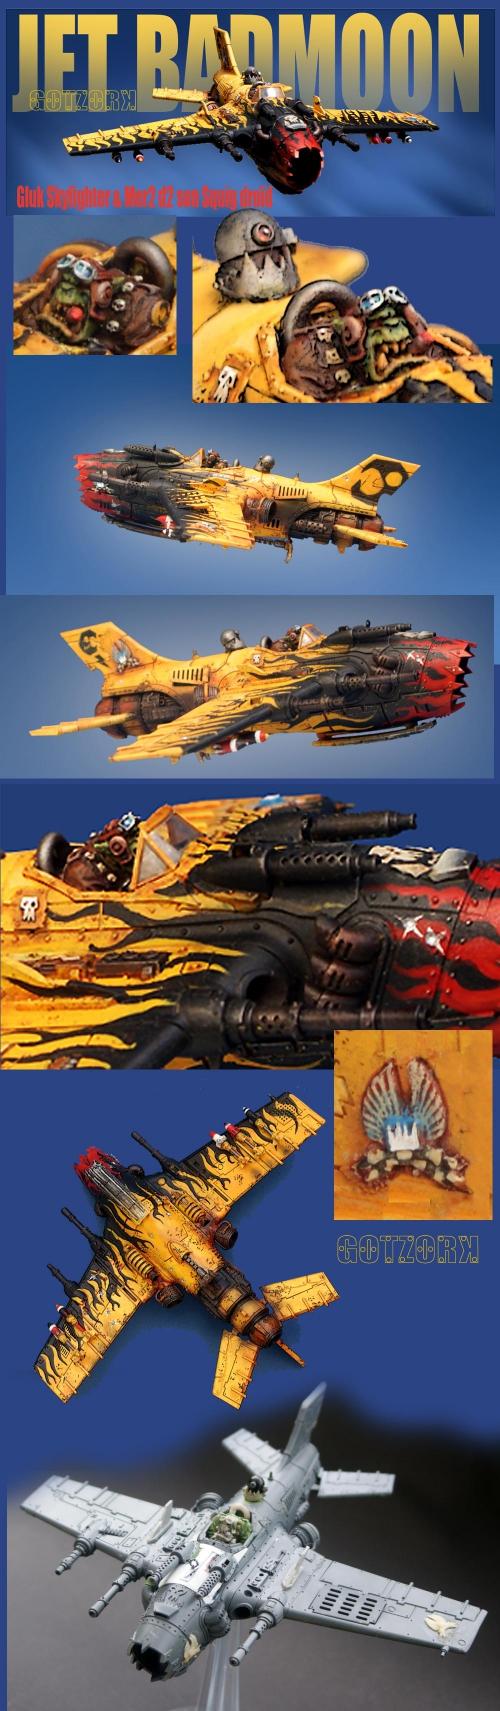 Jet-badmoon-Gkuk-S-bandeau-vertical.jpg